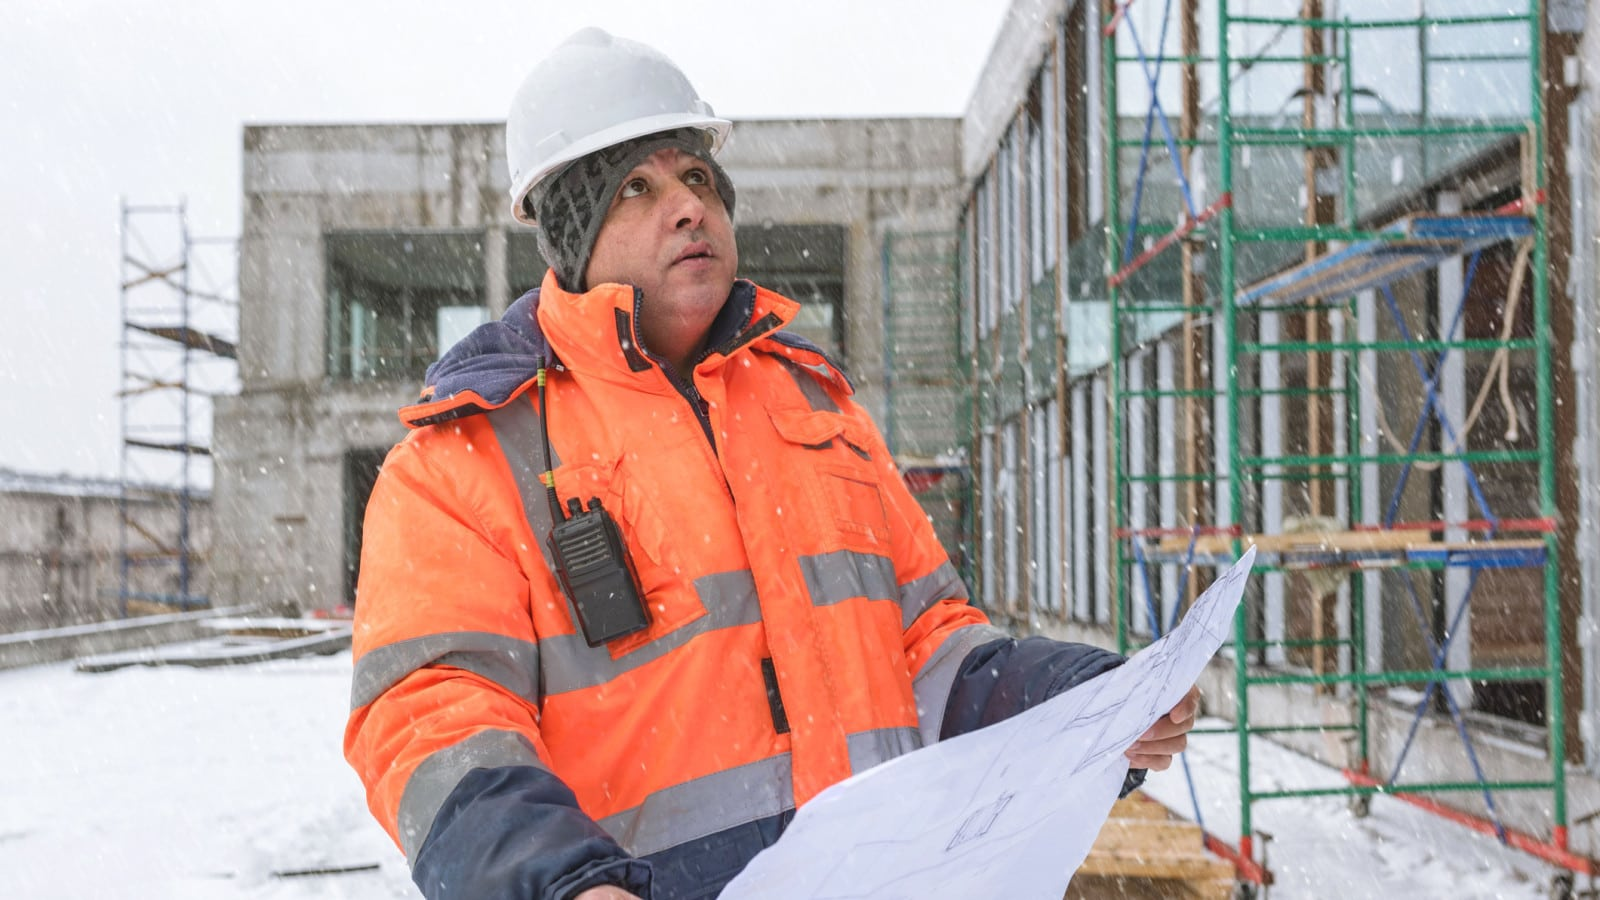 Foreman Construction Site Stock Photo